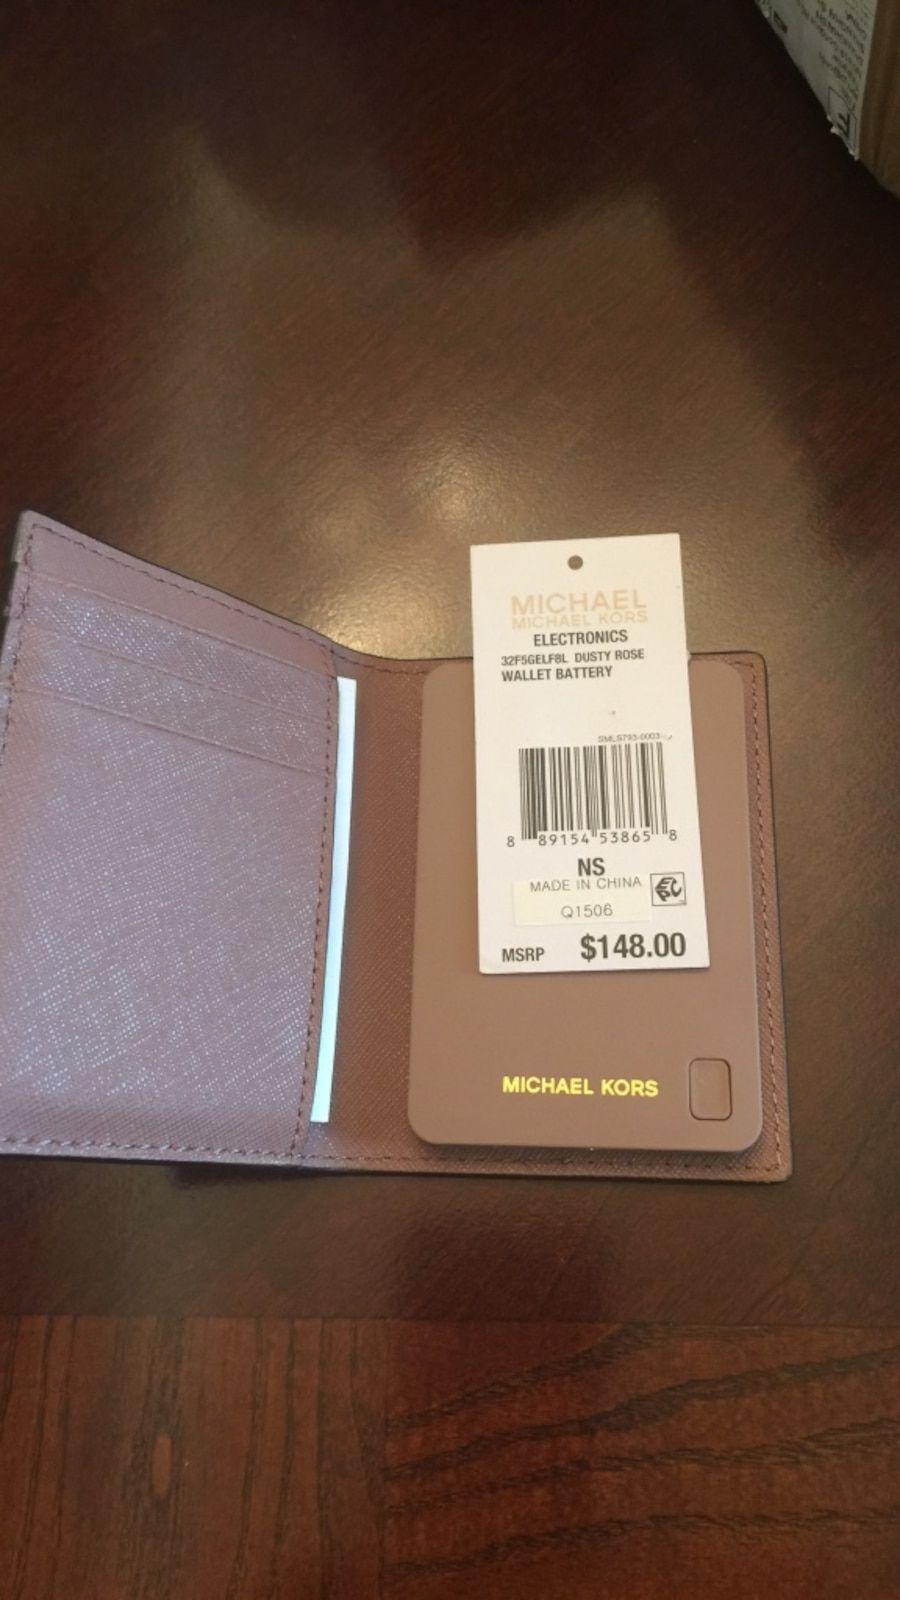 c5d6b848f9fc Michael kors saffiano leather wallet battery blush color in Bossier City -  letgo